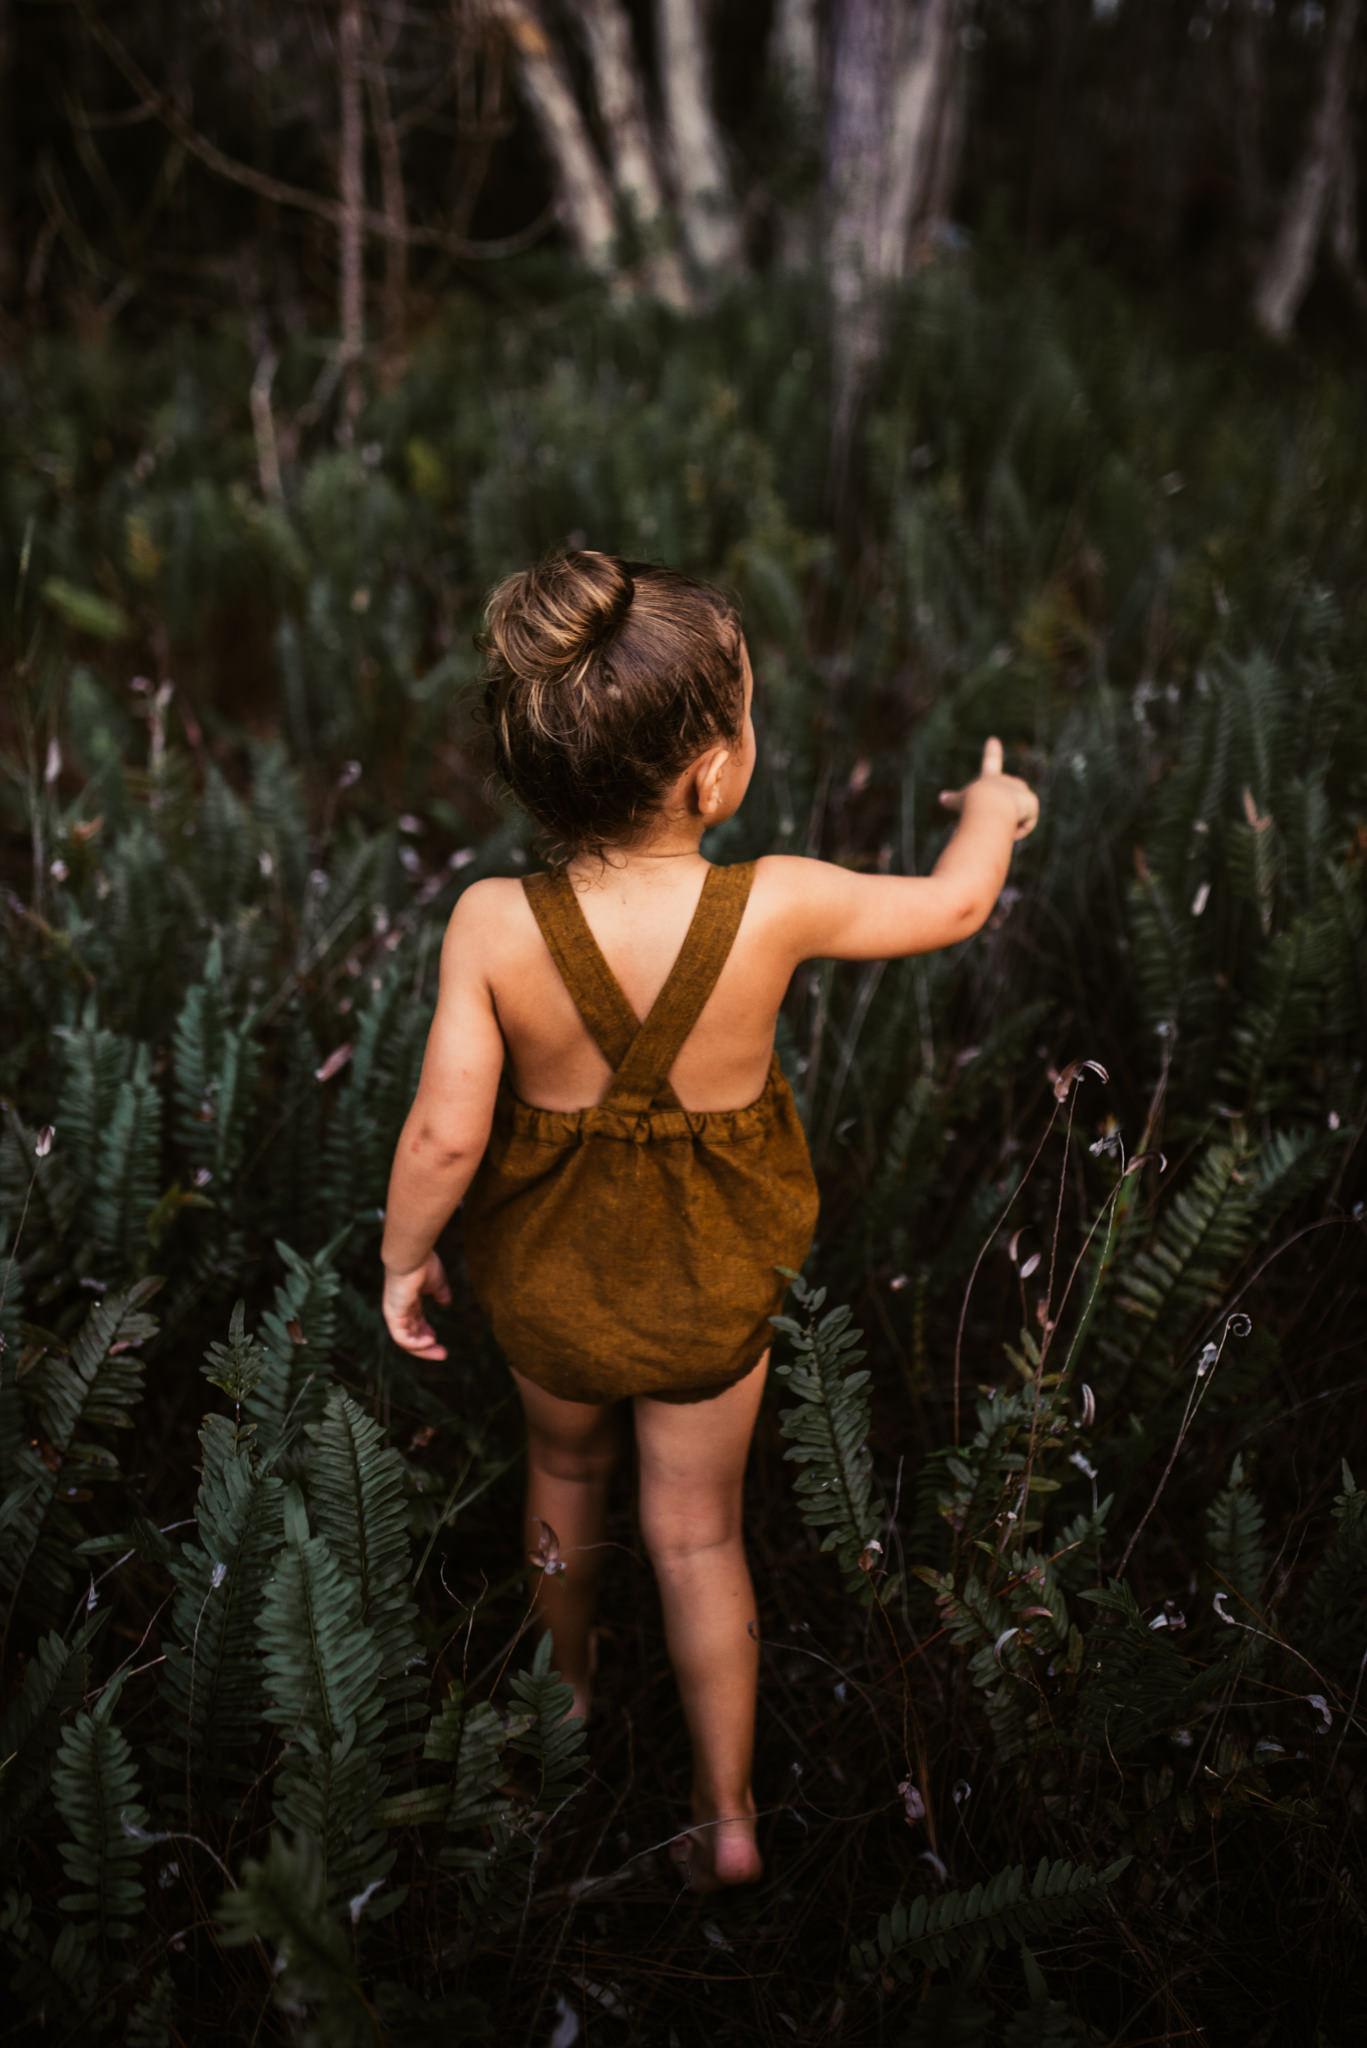 twyla jones photography - treasure coast florida - childrens adventure clothing commercial shoot--51.jpg